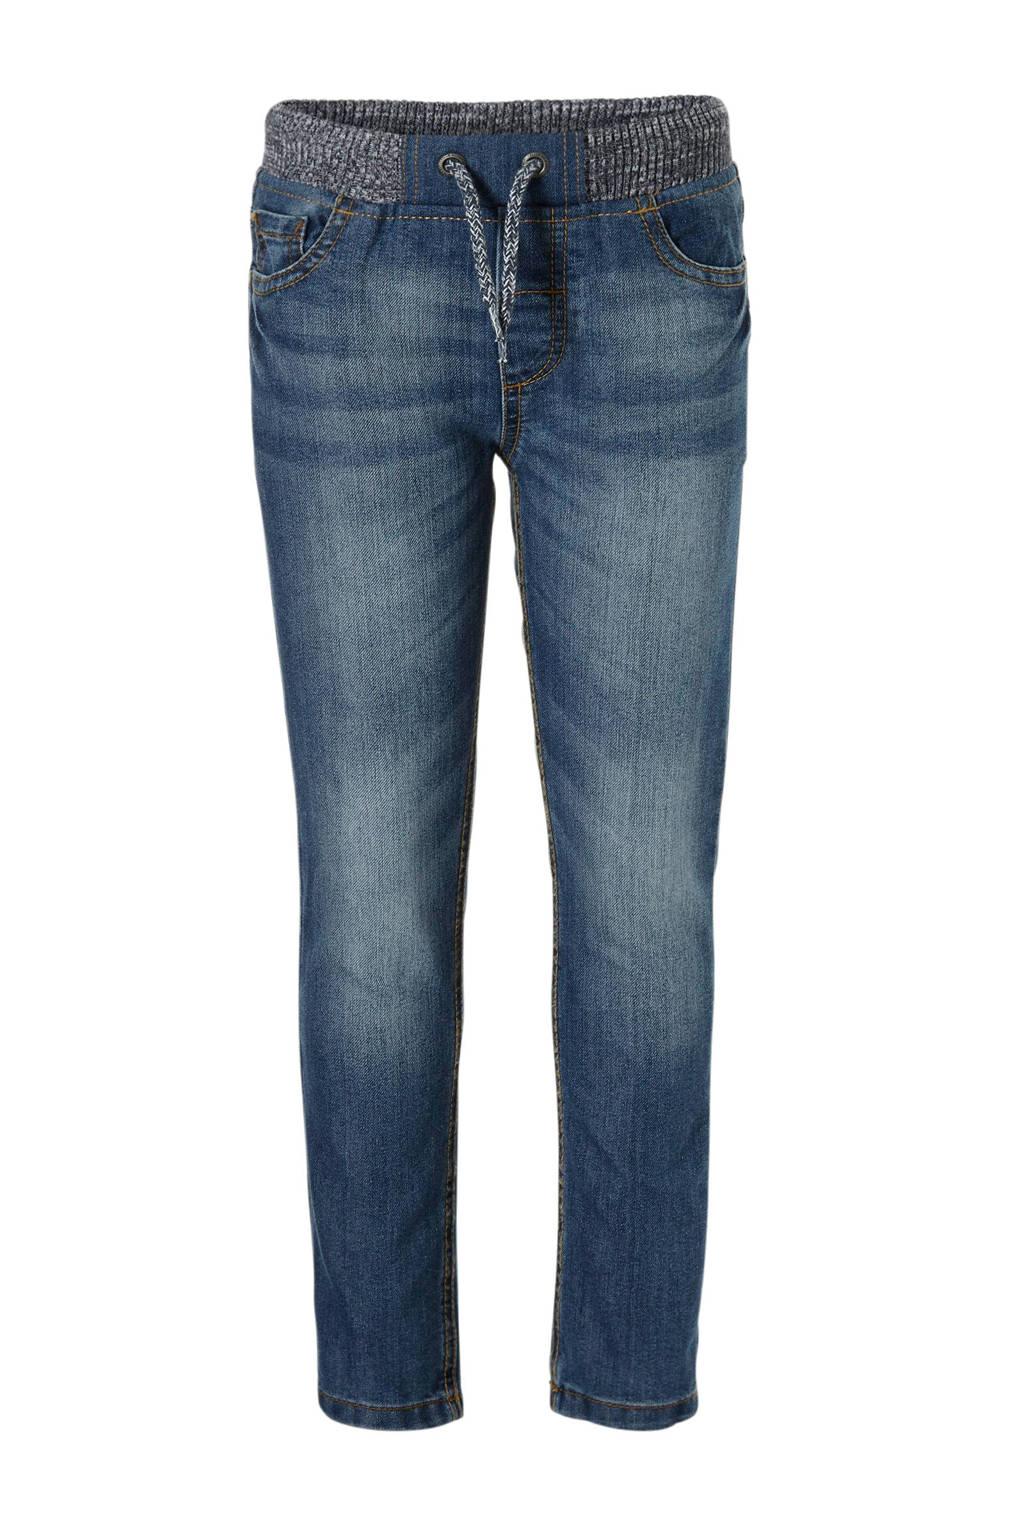 C&A Palomino slim fit jeans, Stonewashed